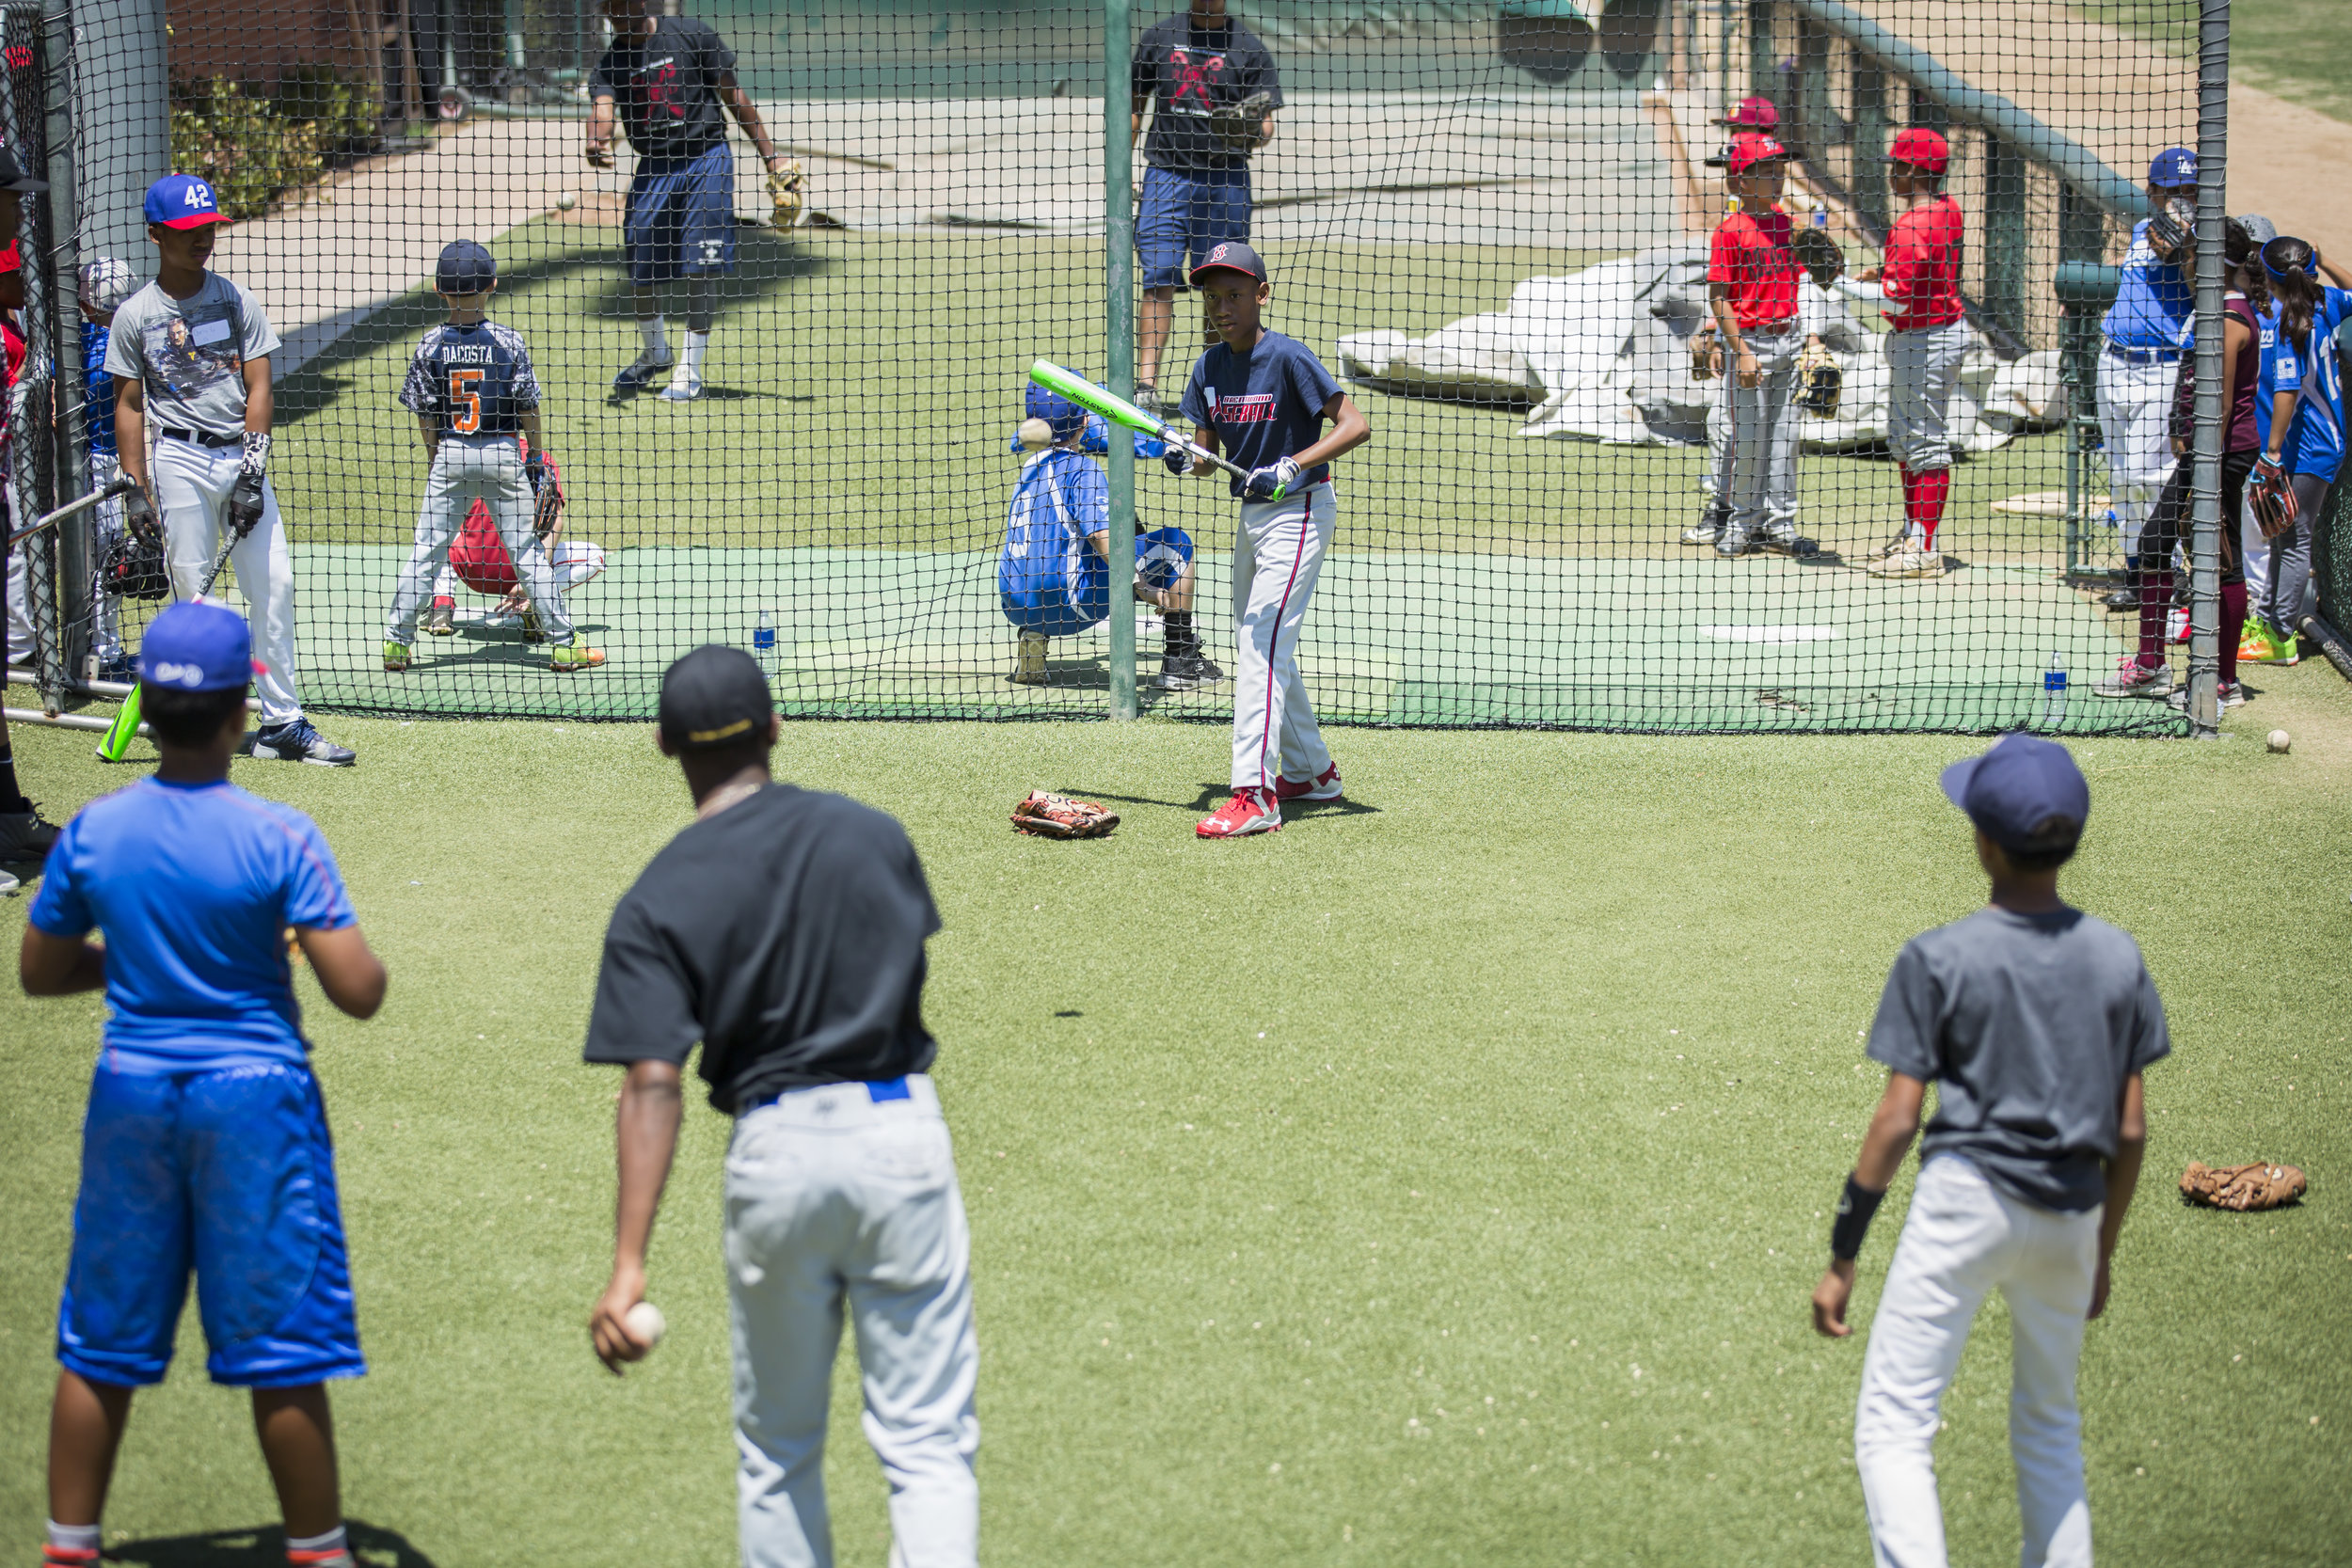 2017_JUNE_BASEBALL_CAMP_BKEENEPHOTO-219.jpg